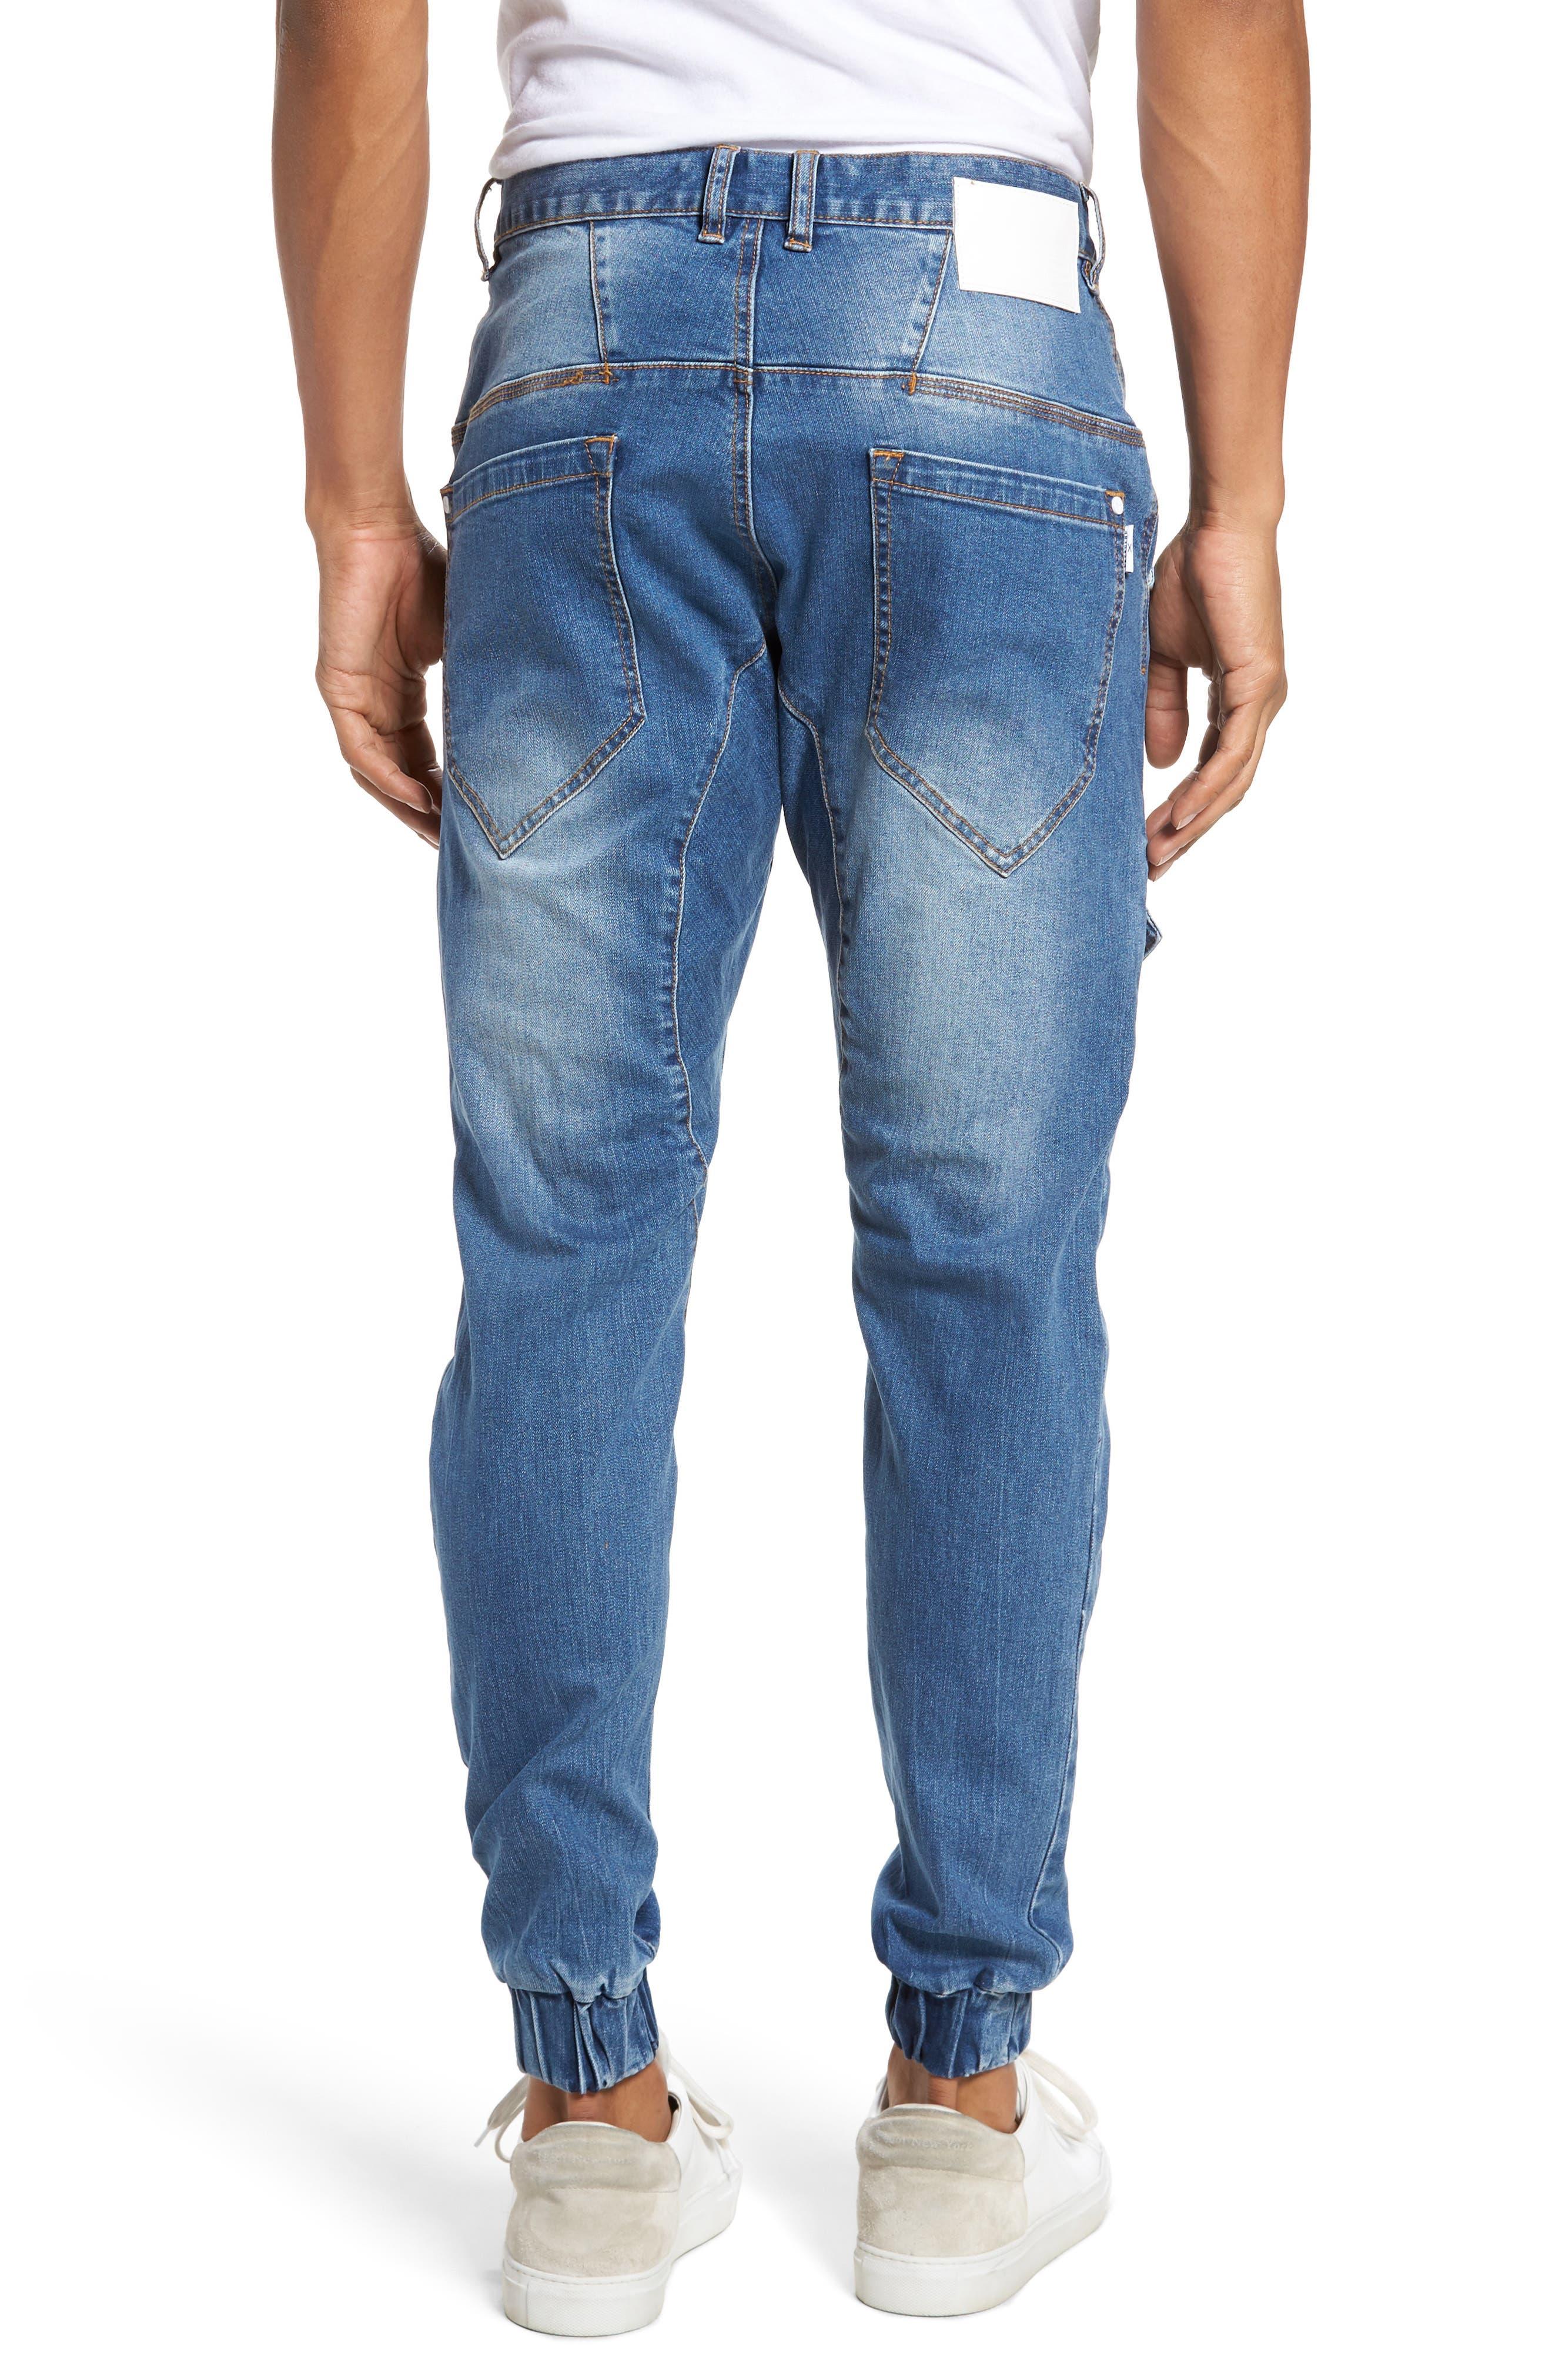 Flight Skinny Denim Jogger Pants,                             Alternate thumbnail 2, color,                             Lincoln Blue